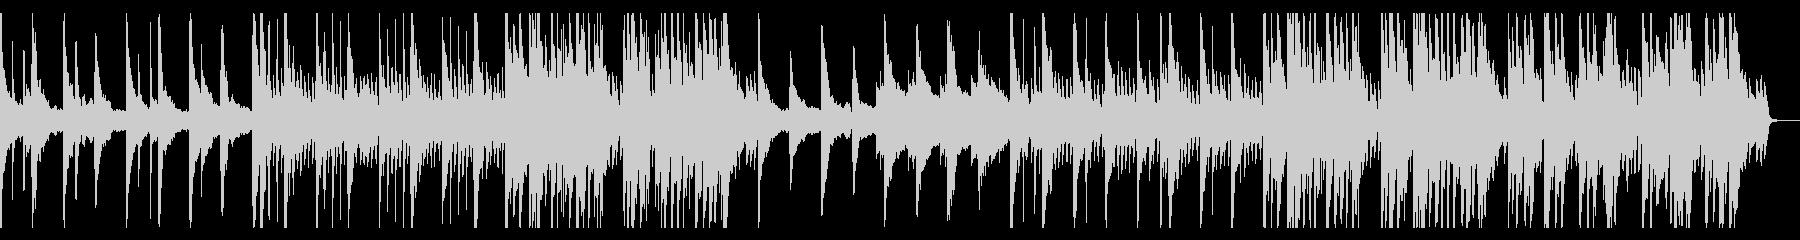 memory. R & B_3's unreproduced waveform